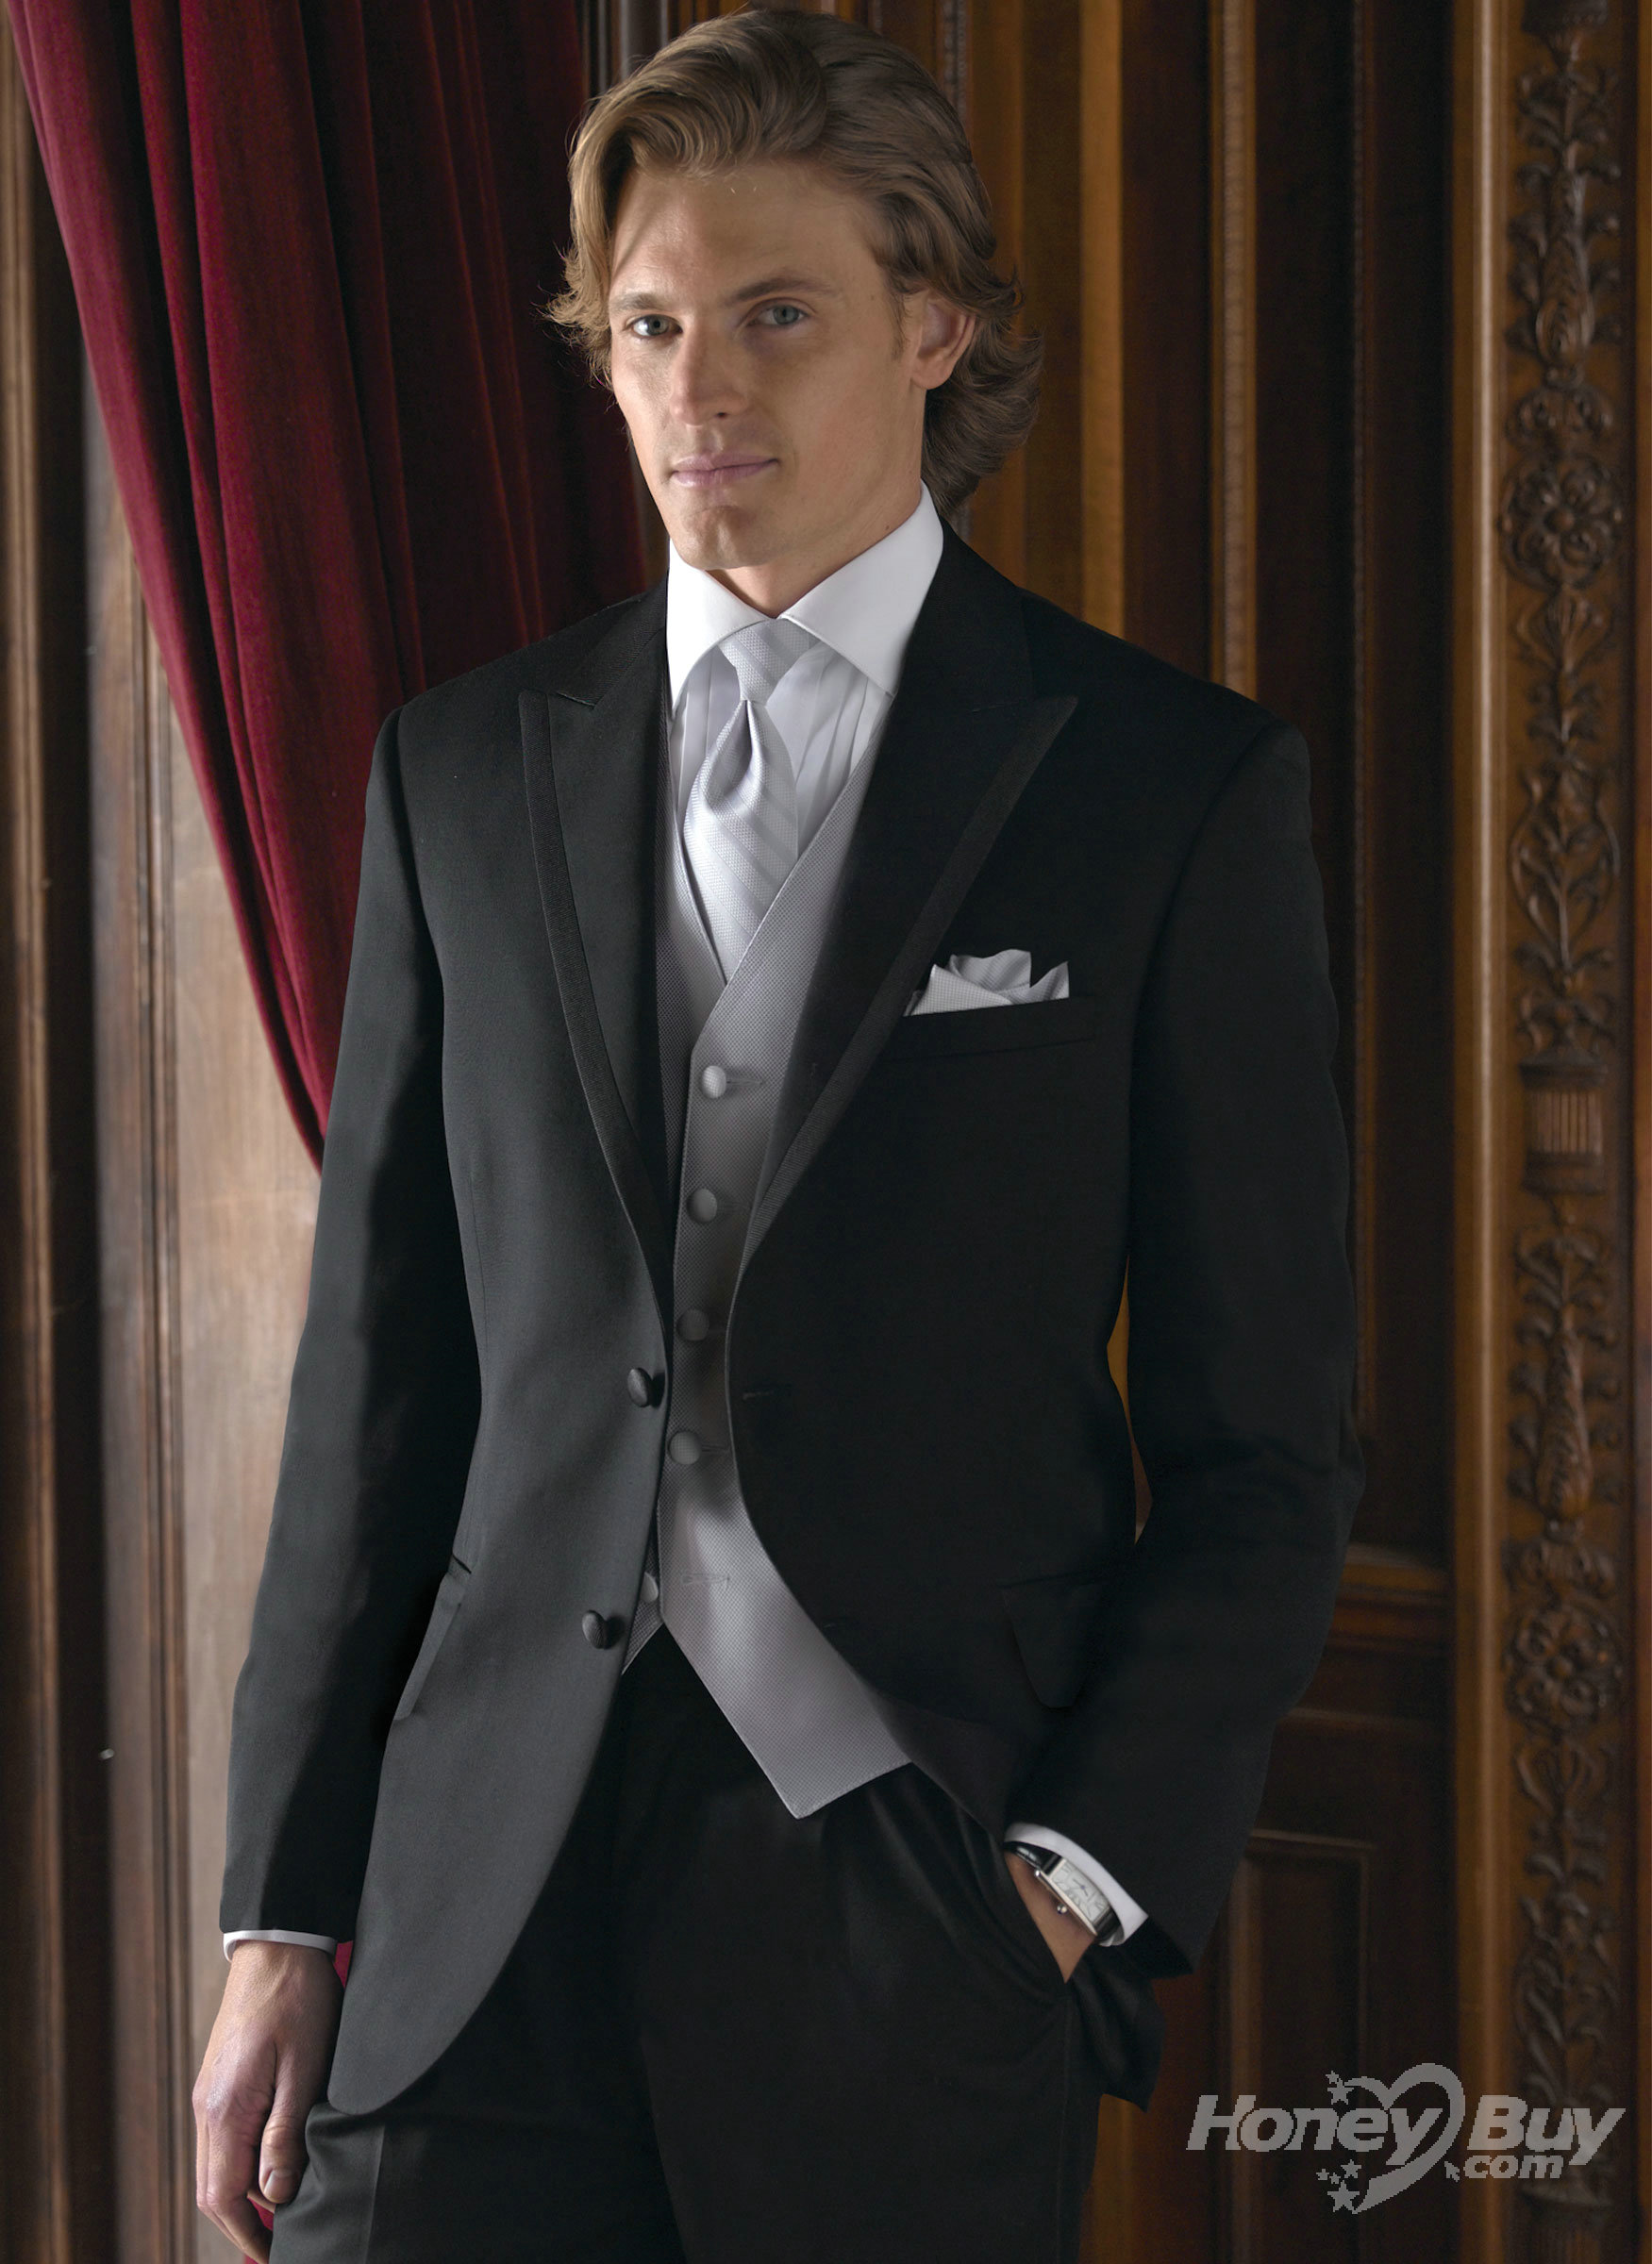 formal suits peak_lapel_design_wholeslae_mens_formal_suits_tailor_made_12623154120325682.jpg vcsuiwk